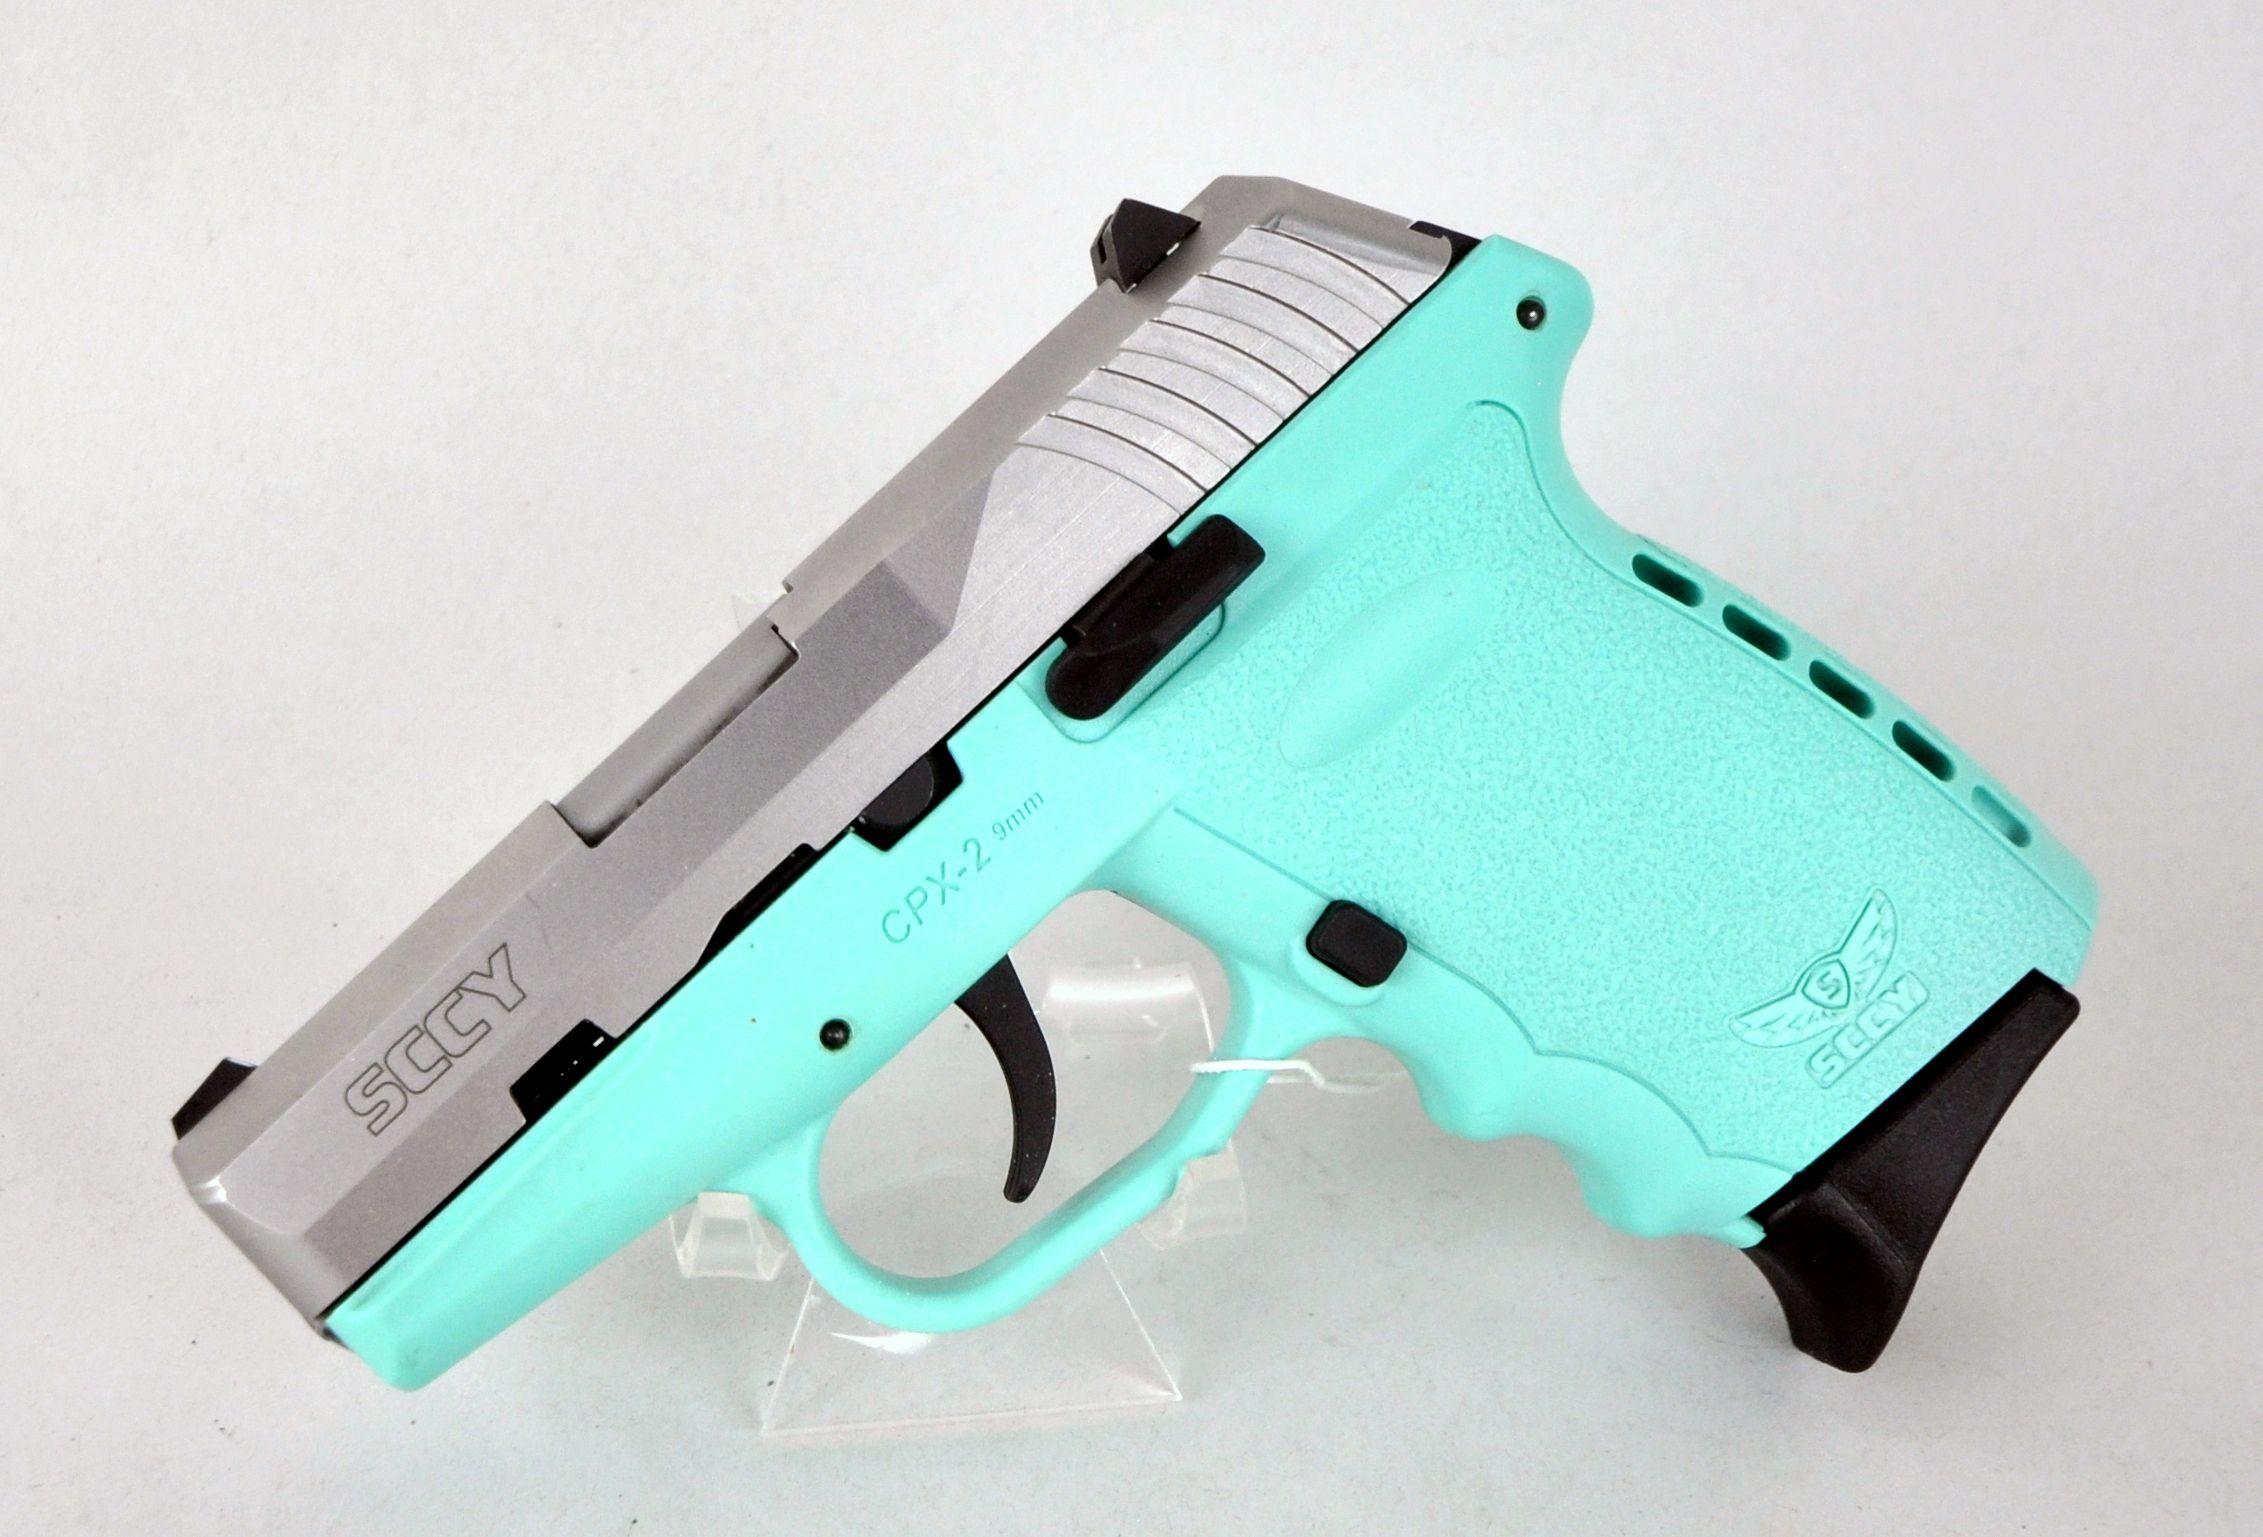 tiffany blue pistol - HD2263×1537